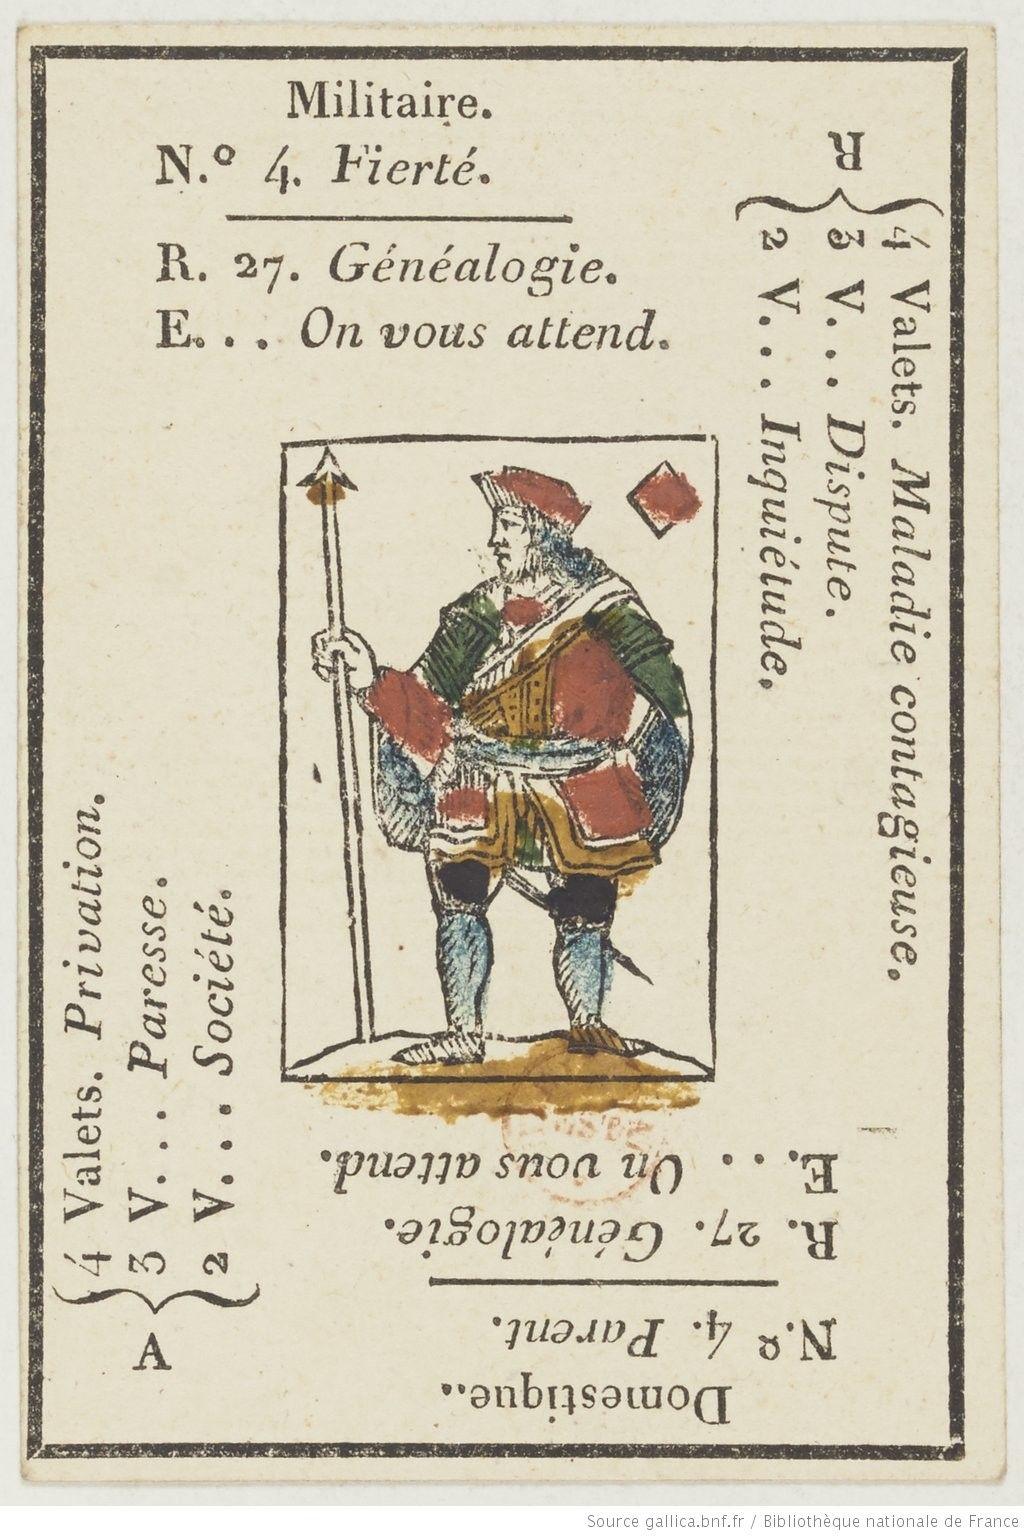 Jeu De Cartomancie Dit Petit Etteilla Jeu Divinatoire Jeu De Cartes Estampe Gallica Jeu De Cartes Cartomancie Carte A Jouer